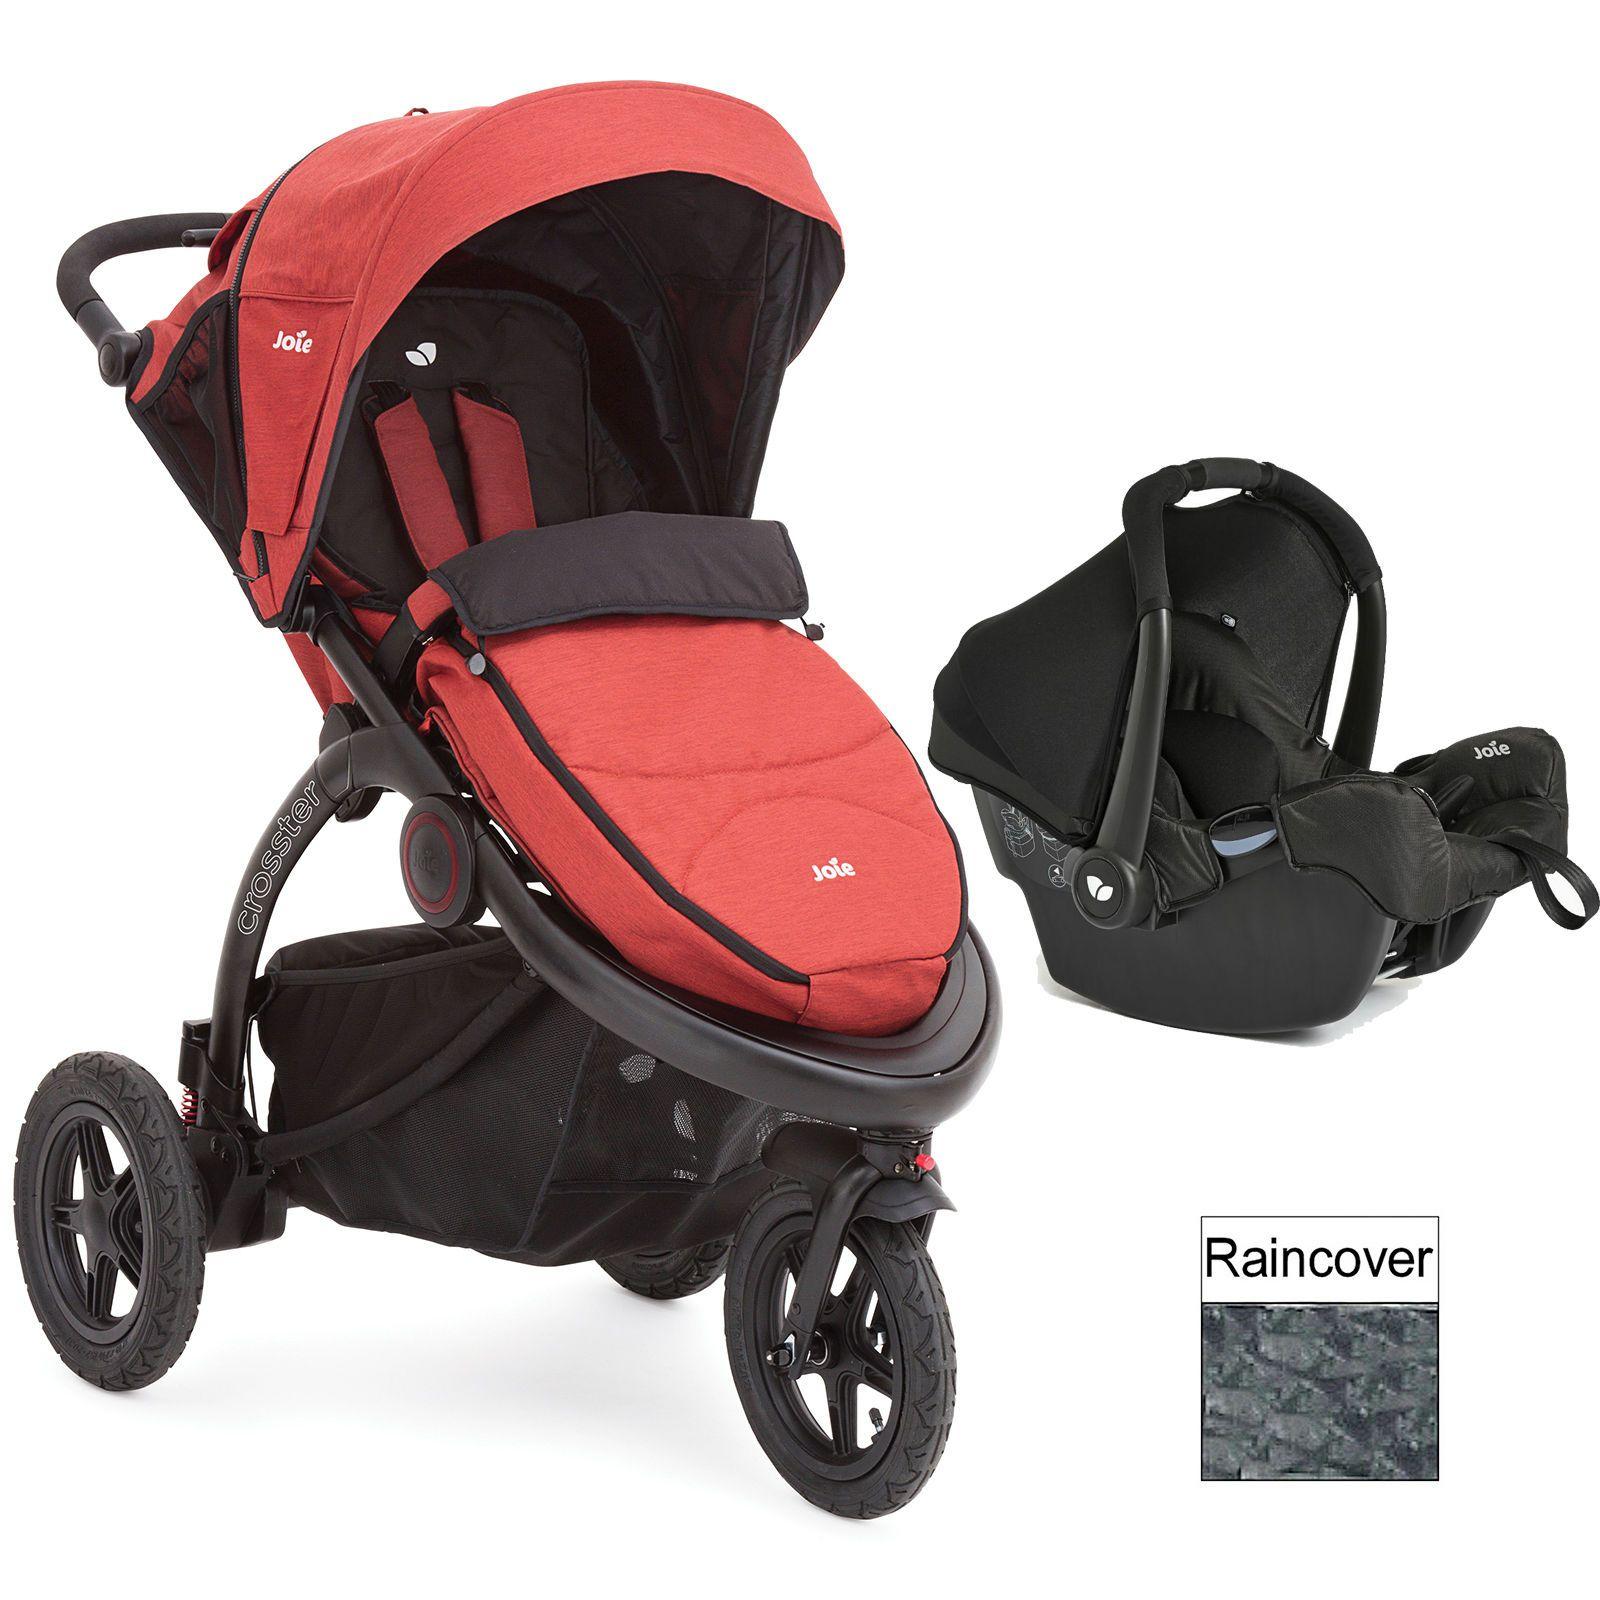 Joie rust orange crosster 3 wheeler travel system